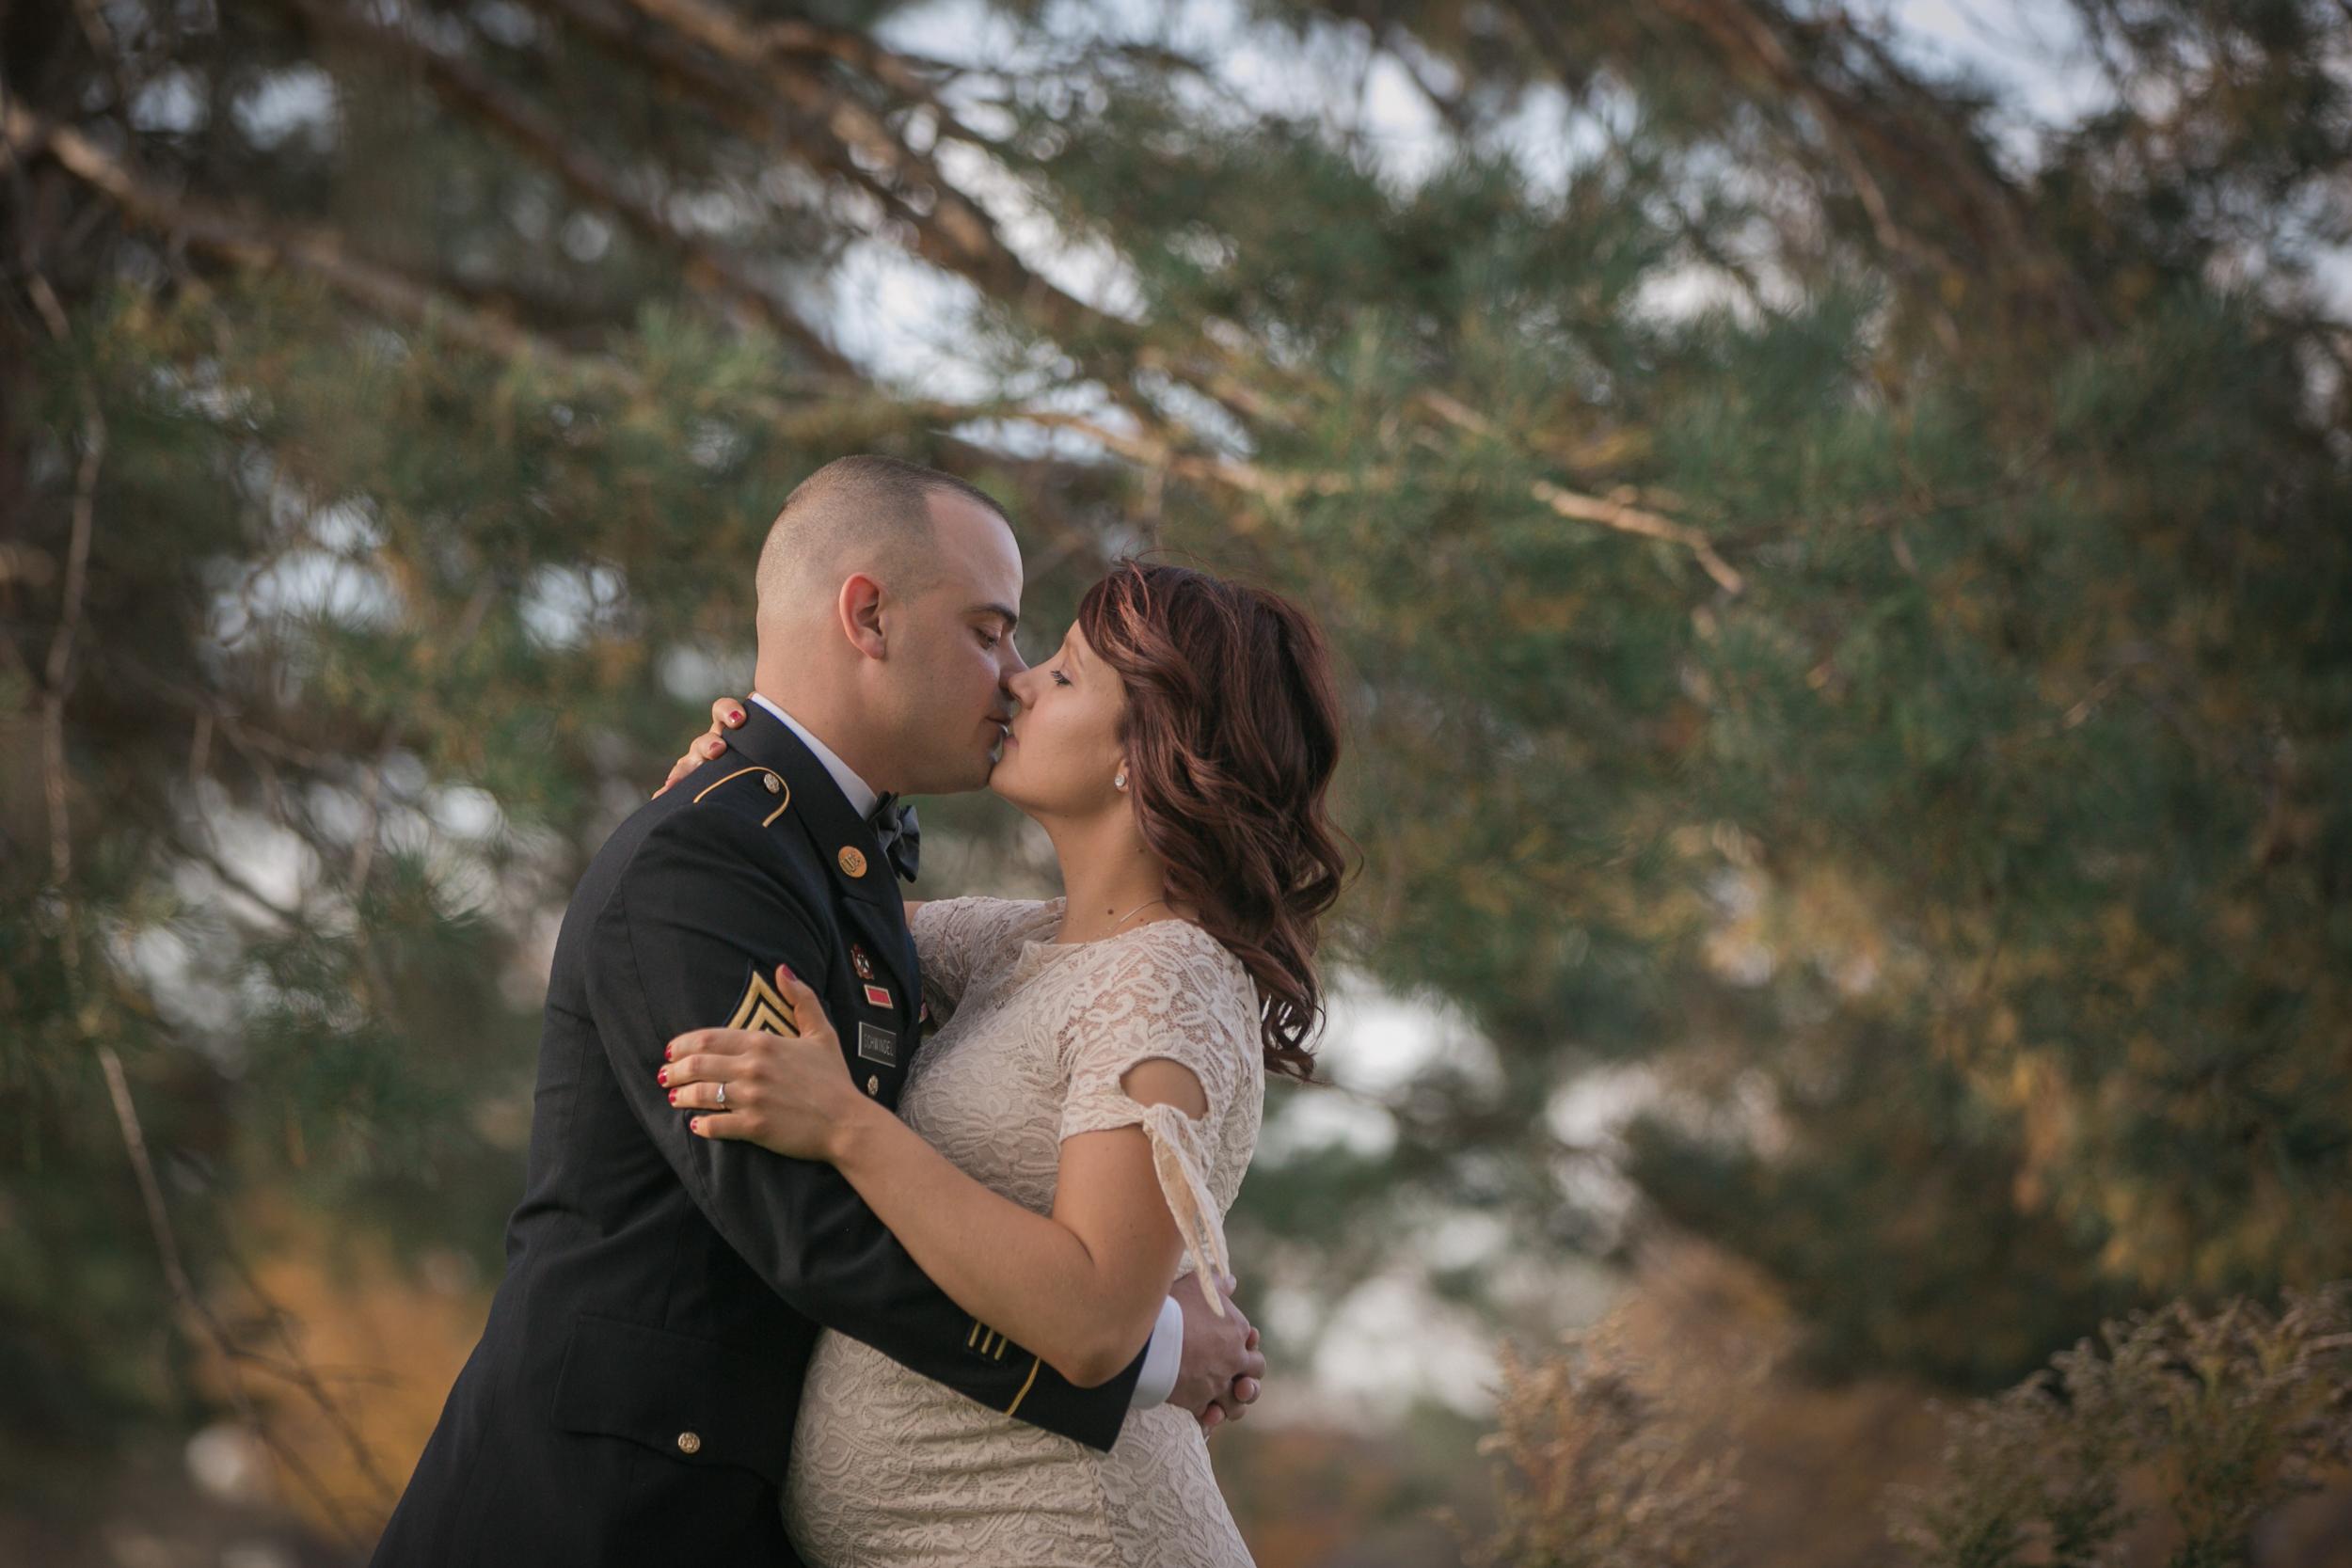 Fort Snelling Elopement St. Paul, MN, Fort Snelling Elopement, Military Elopement, Intimate Military Wedding, intimate elopement wedding-www.rachelsmak.com15.jpg